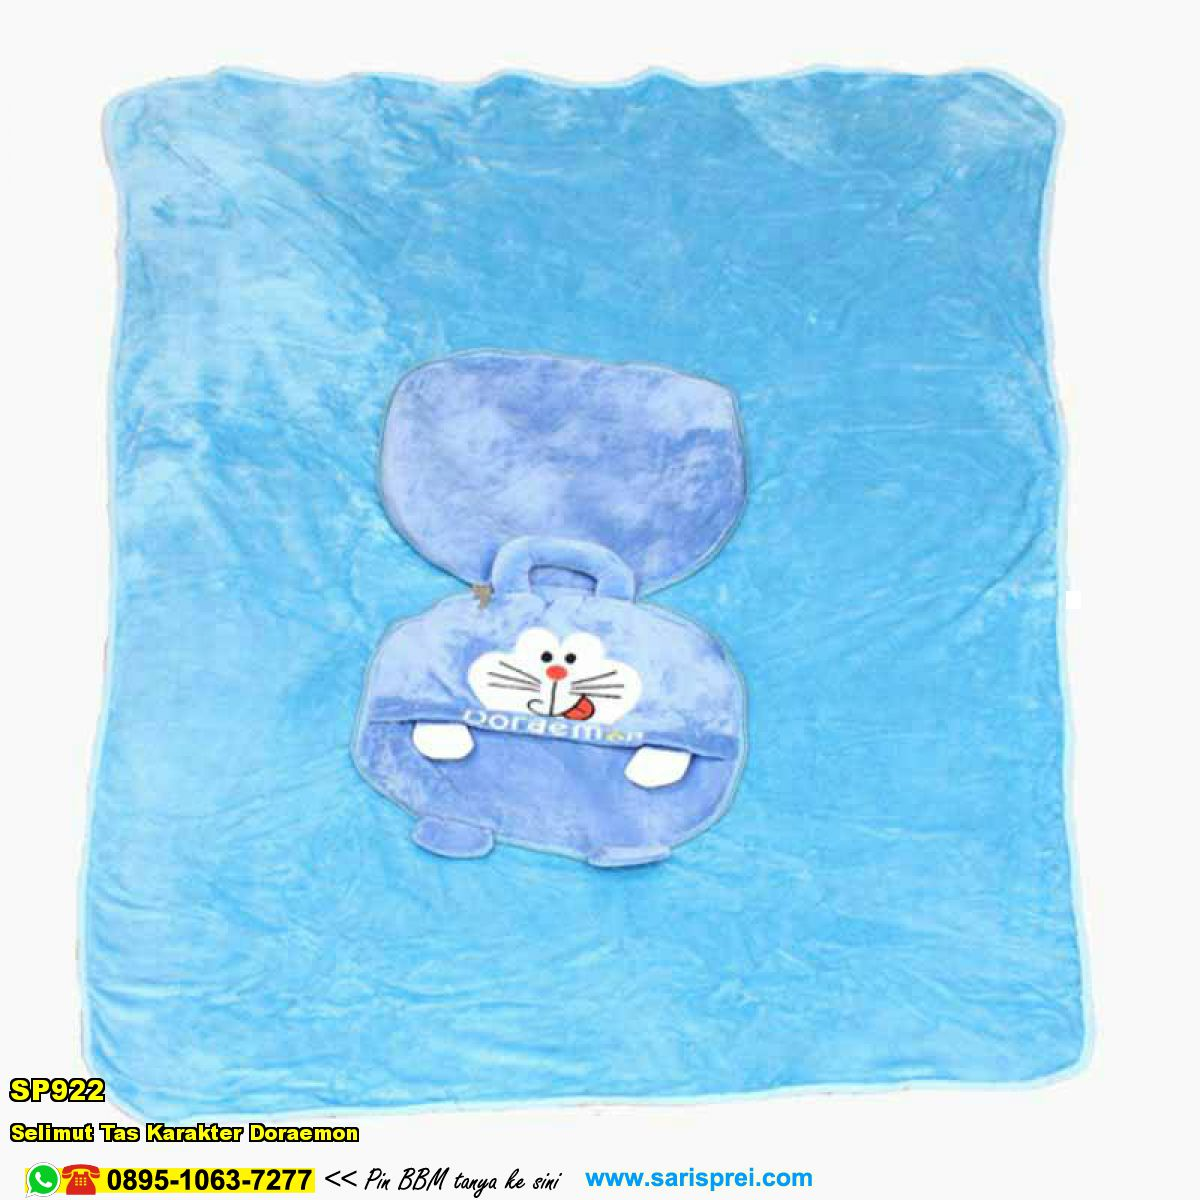 Grosir Sprei Cantik Selimut Tas Karakter Stitch Biru Ungu Kartun 100x150 Cm